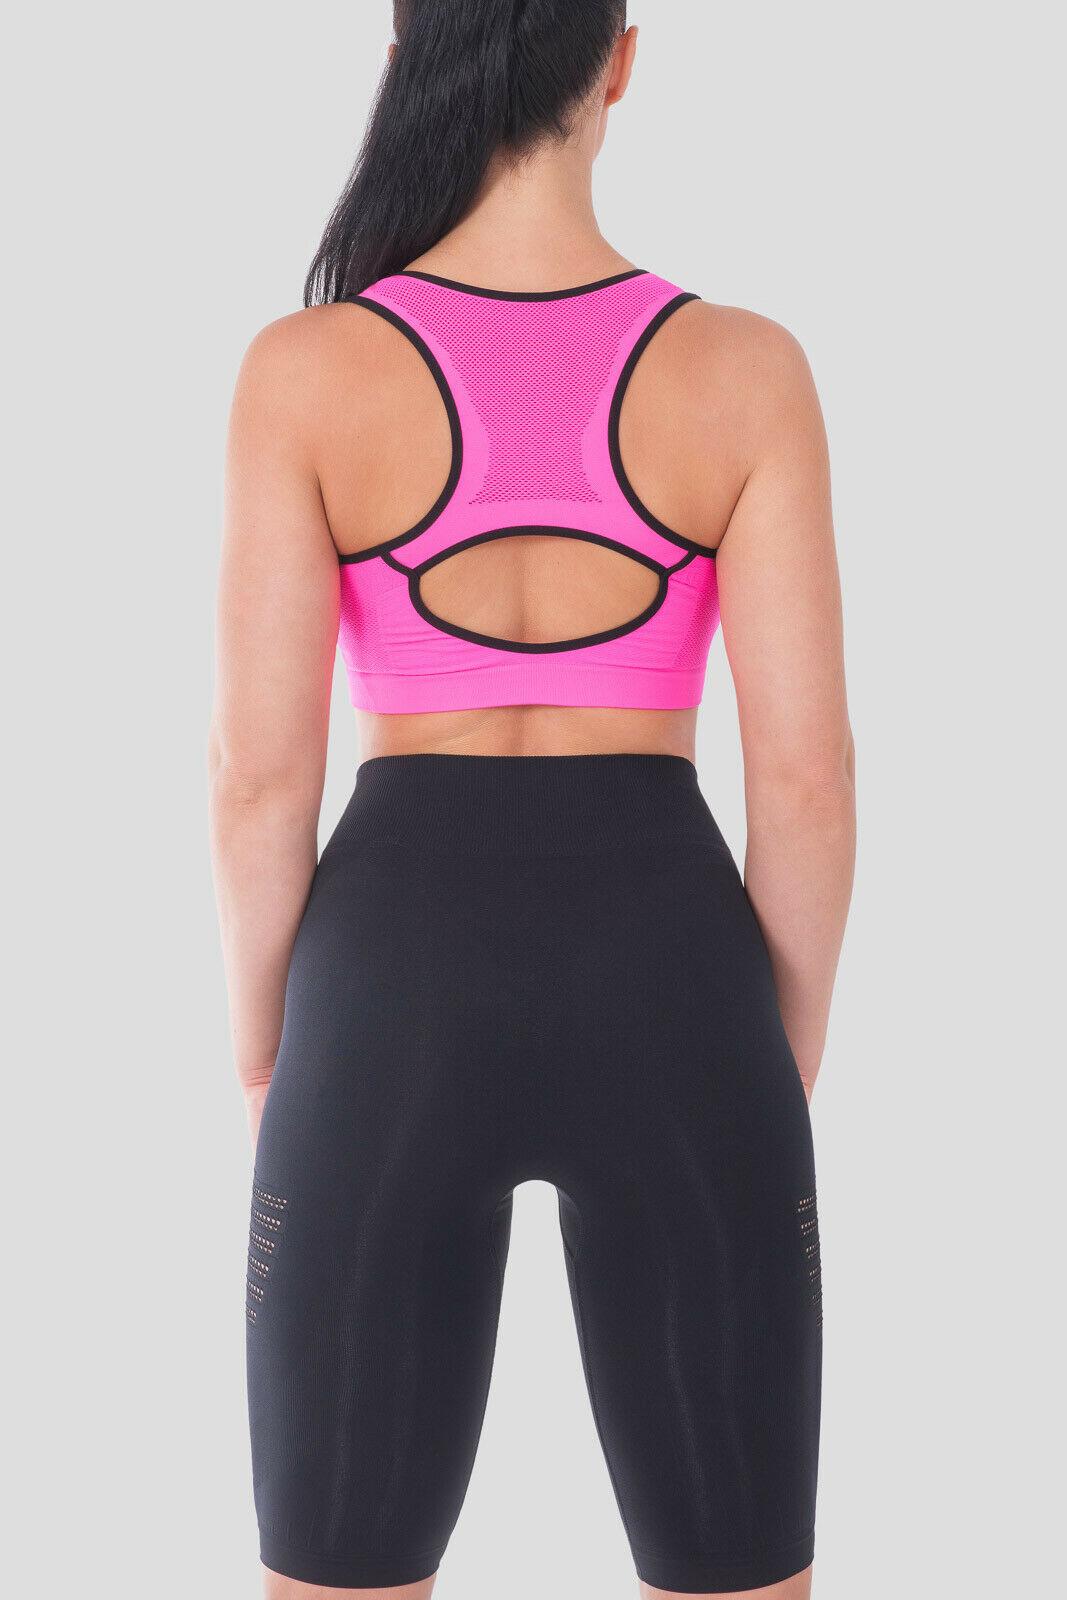 Bellissima-Women-039-s-Sport-Bra-Running-Yoga-Workout-Fitness-Racerback-Seamless thumbnail 40